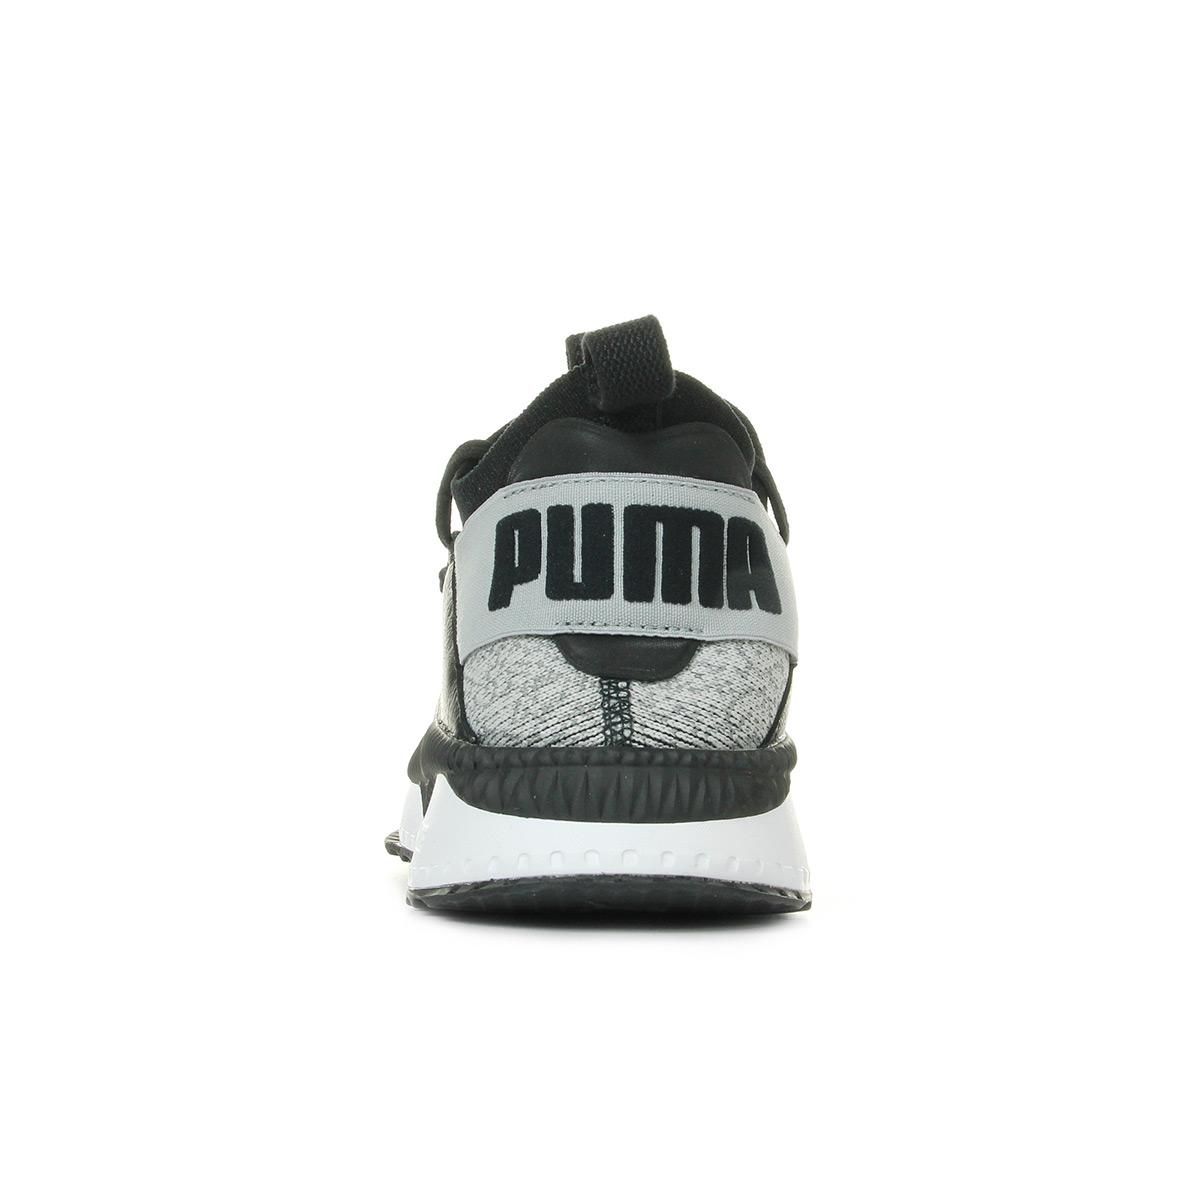 Puma TSUGI JUN QUIET SHADE 36548903, Baskets mode homme